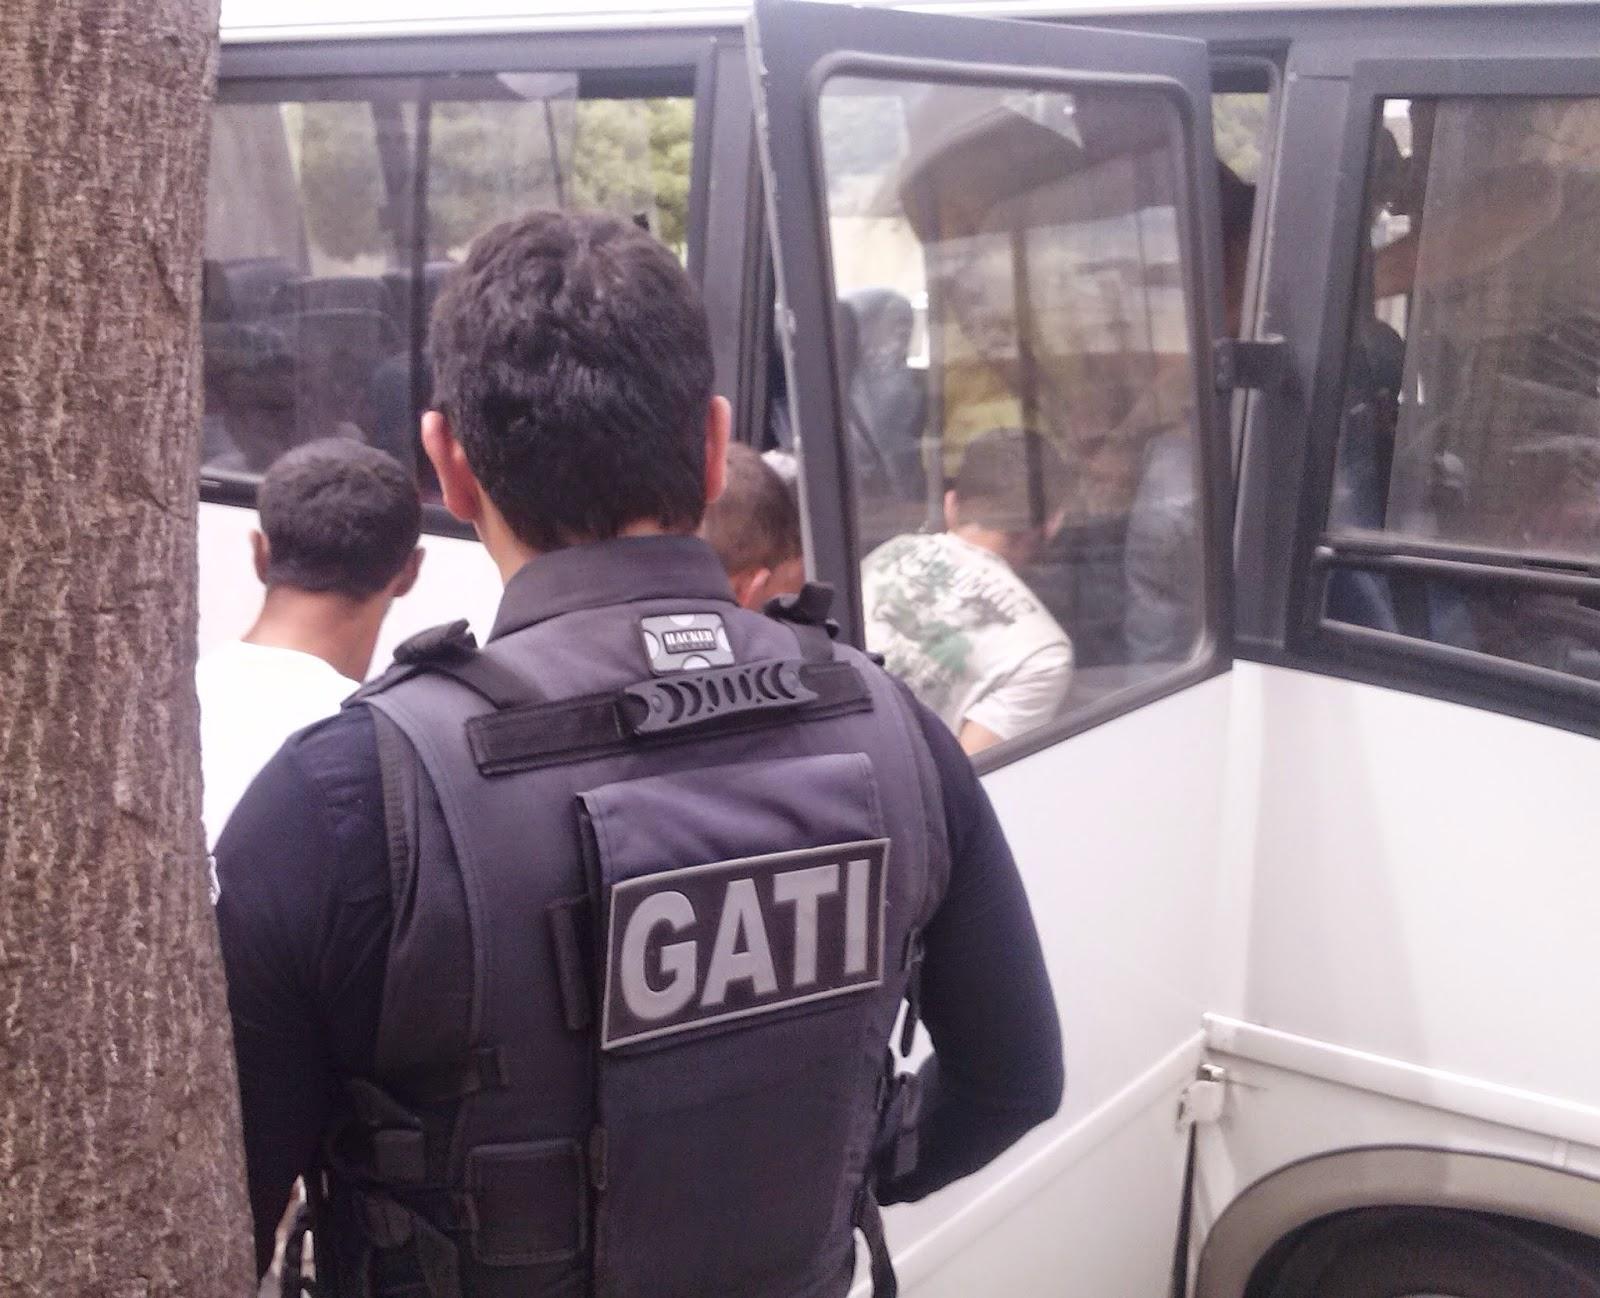 TÁBUA: Bombeiros adquirem mochilas de apoio ao combate de